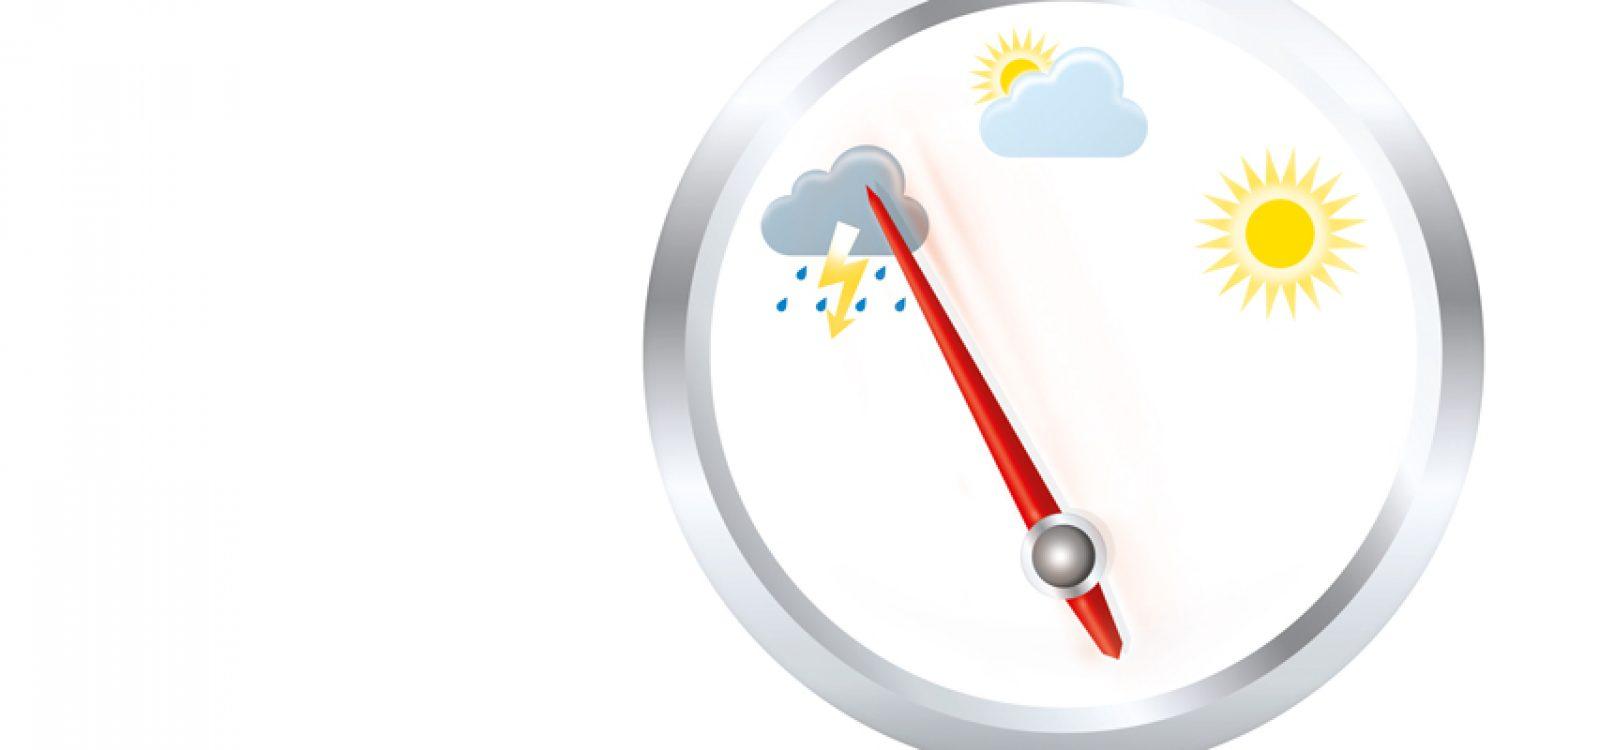 2013 J.P. Morgan – Taylor Fry General Insurance Barometer